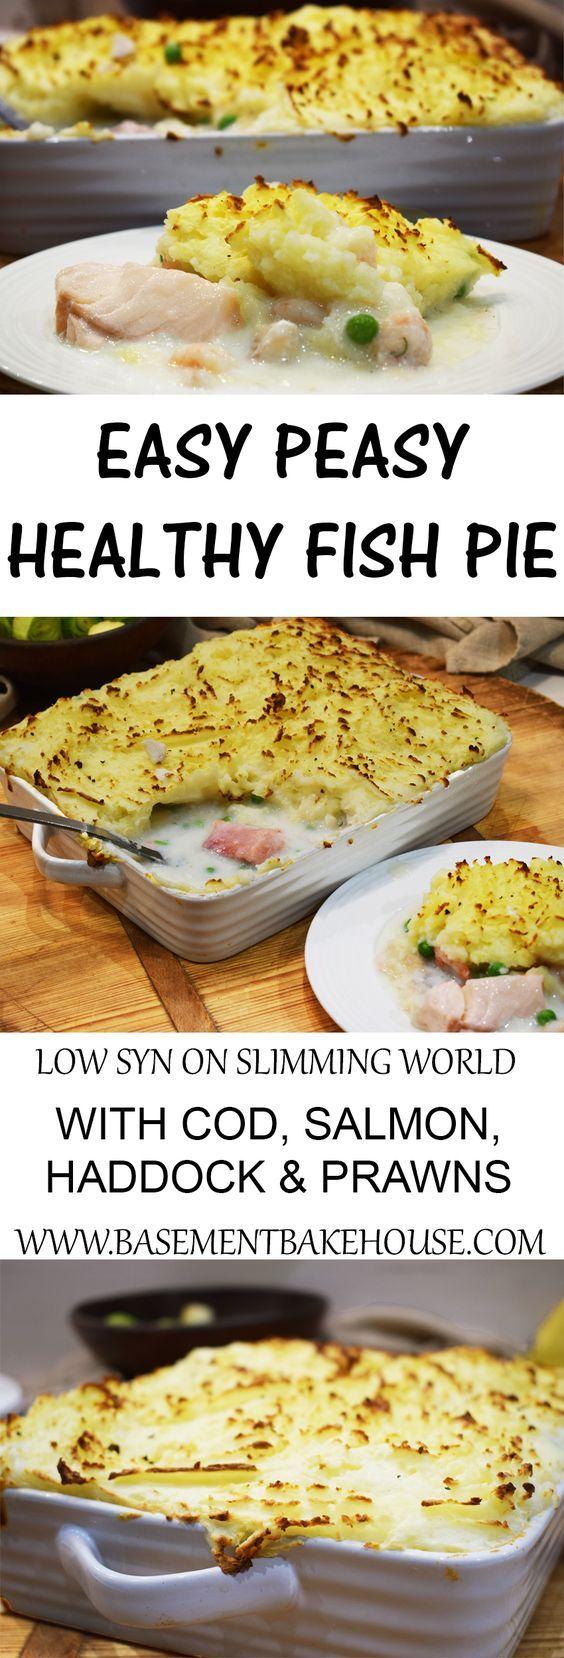 Easy Peasy Homemade Healthy Fish Pie - Slimming World - Low Syn - #PowerOfFrozen - Iceland Foods - Healthy Fish Pie - Recipe